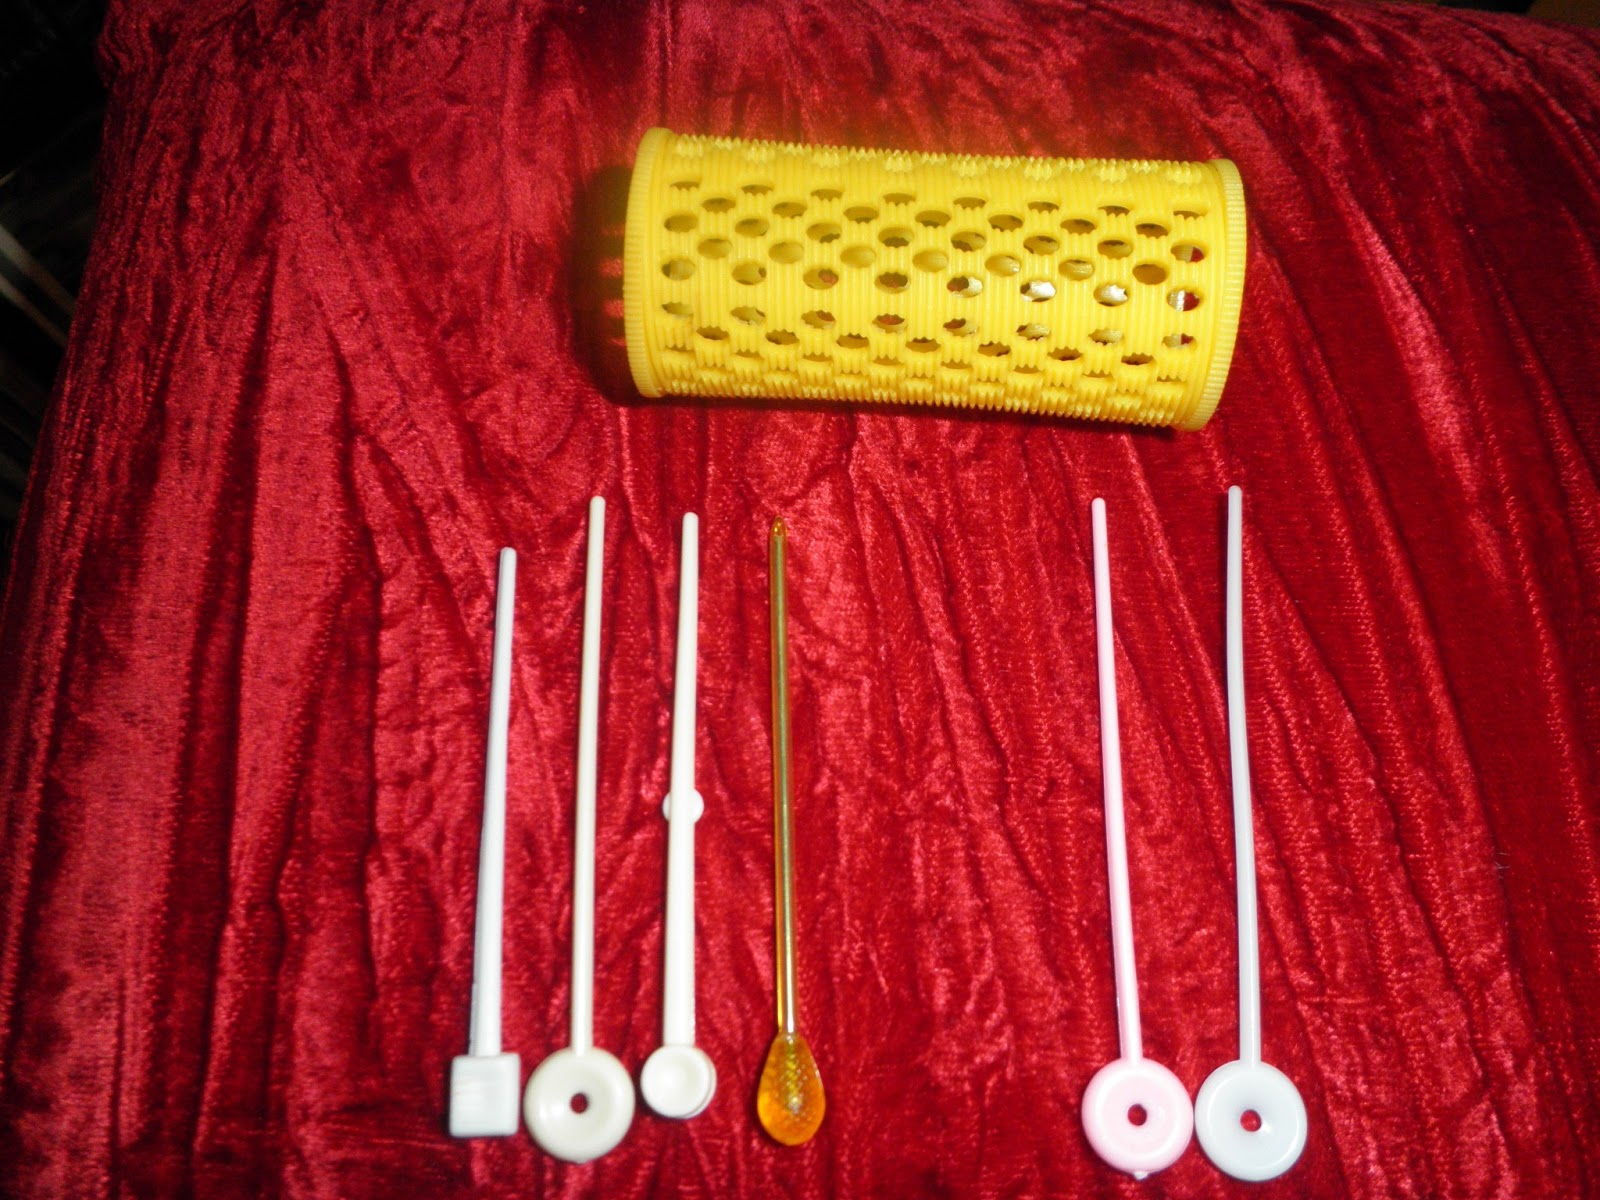 PhenomenalhairCare: Using Hair Roller Stick picks